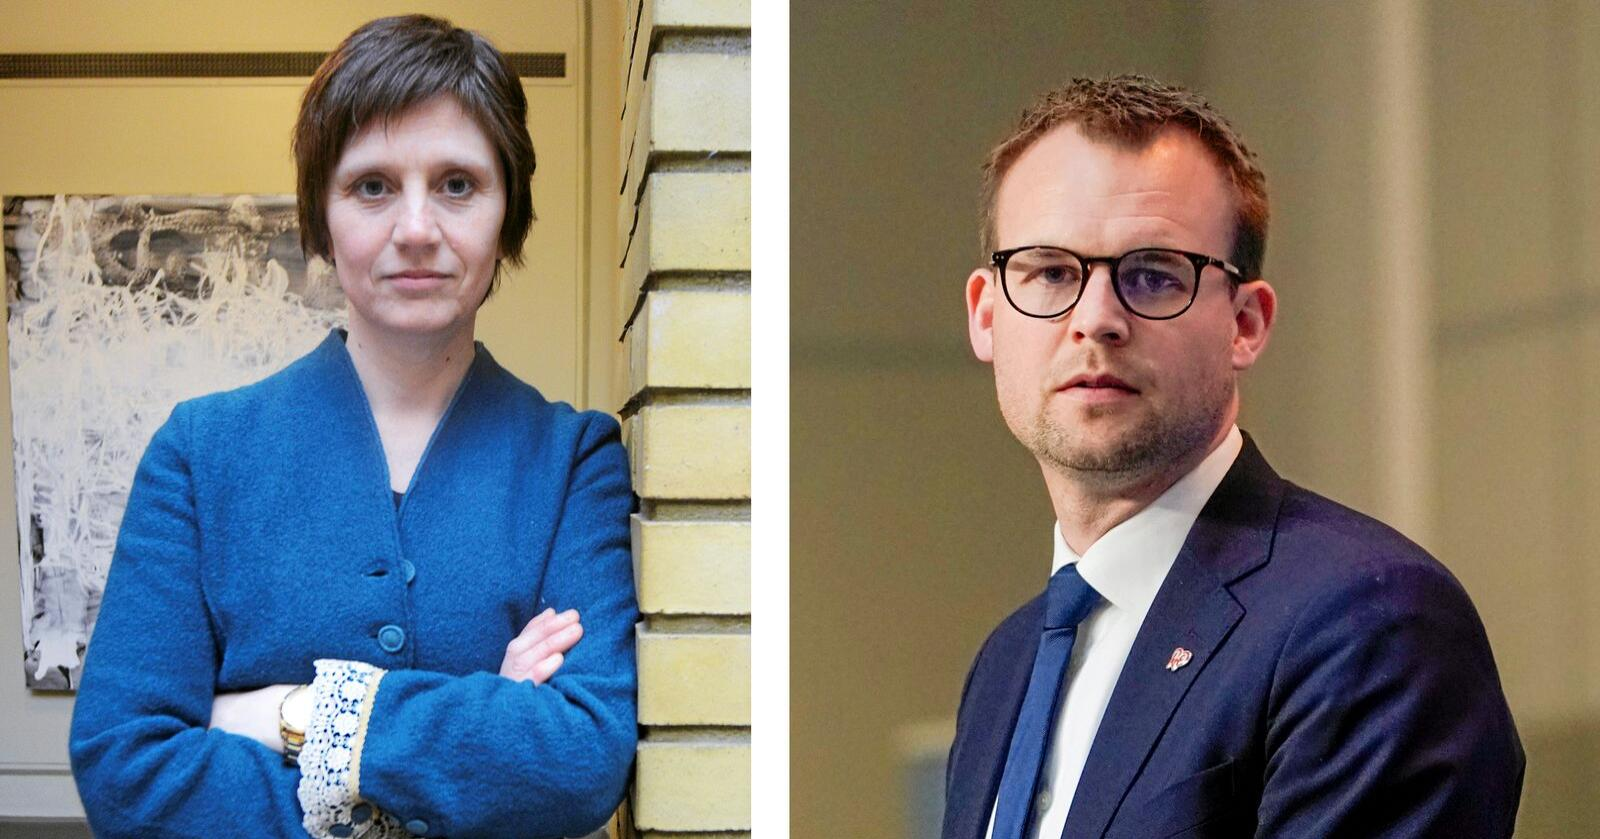 Helsepolitisk talsperson i Senterpartiet Kjersti Toppe er enig med KrF-leder Ropstad i saken om endringer i bioteknologiloven. Andre i Sp har ikke bestemt seg. Foto: Fredrik Hagen / NTB scanpix